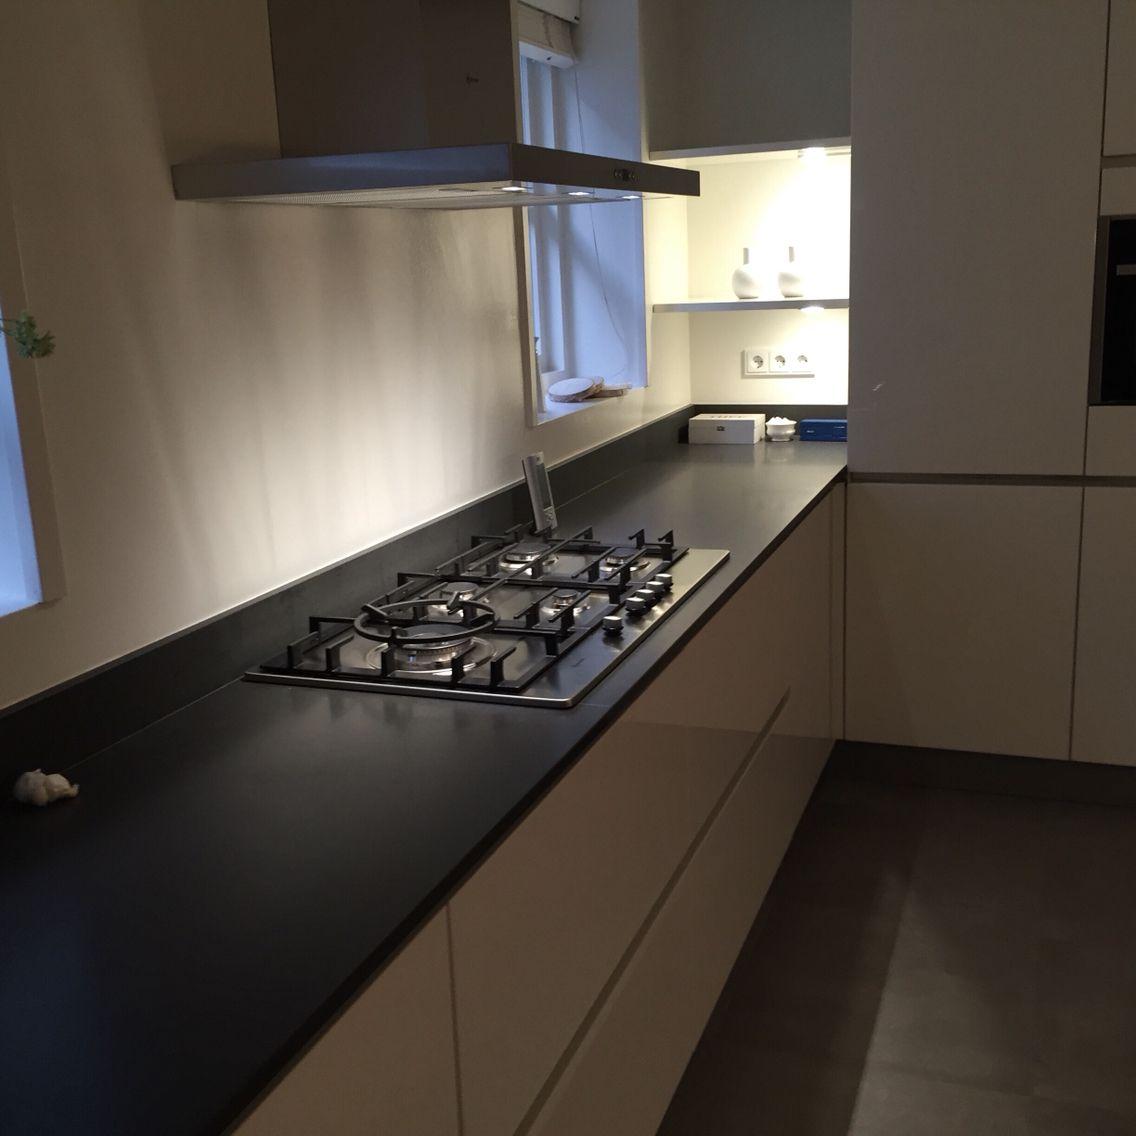 systemat av 4030 gl met ceasarstone 4120 en combi quooker fushion h cker systemat keukens. Black Bedroom Furniture Sets. Home Design Ideas